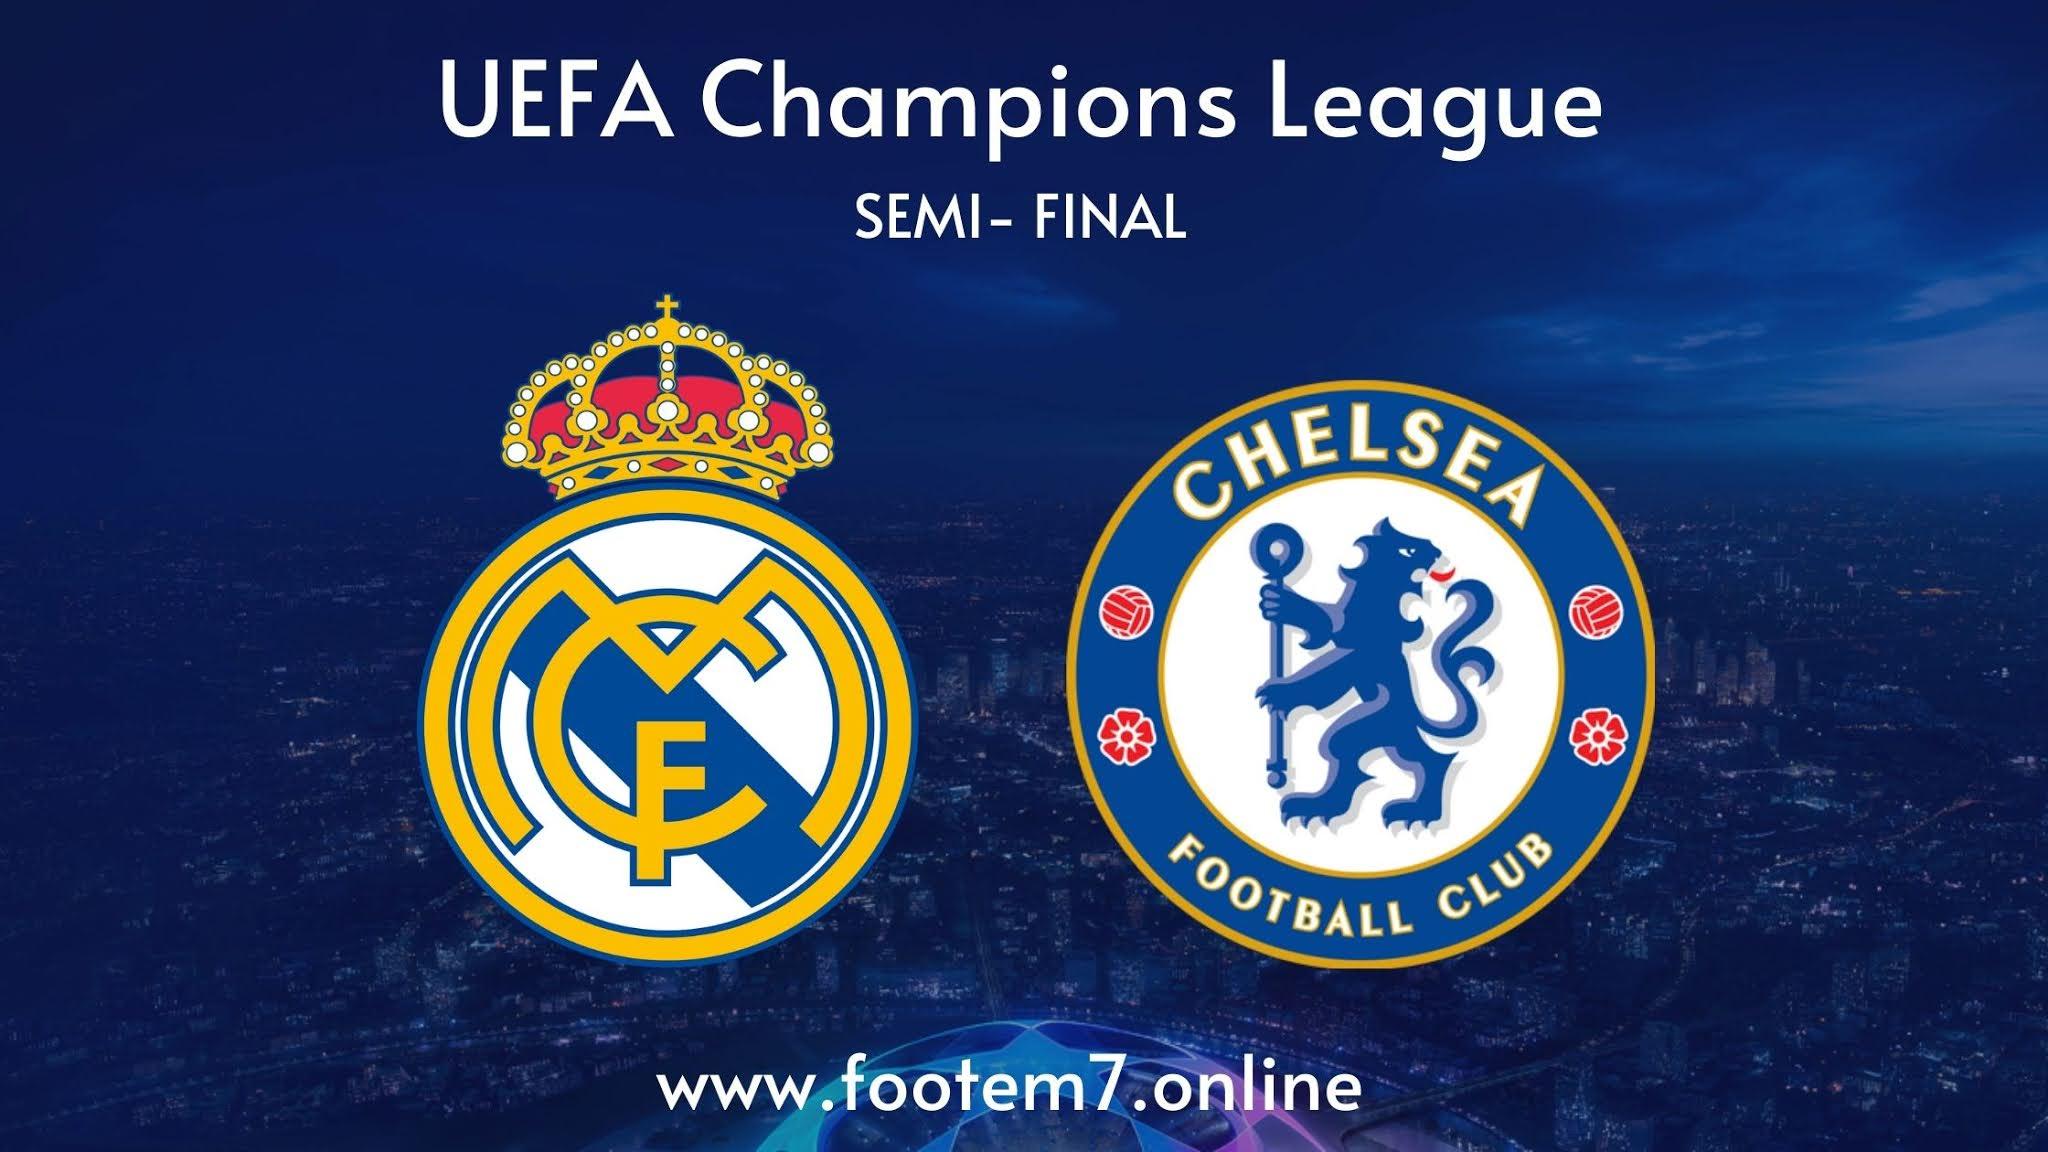 Real Madrid vs Chelsea semi final champions league